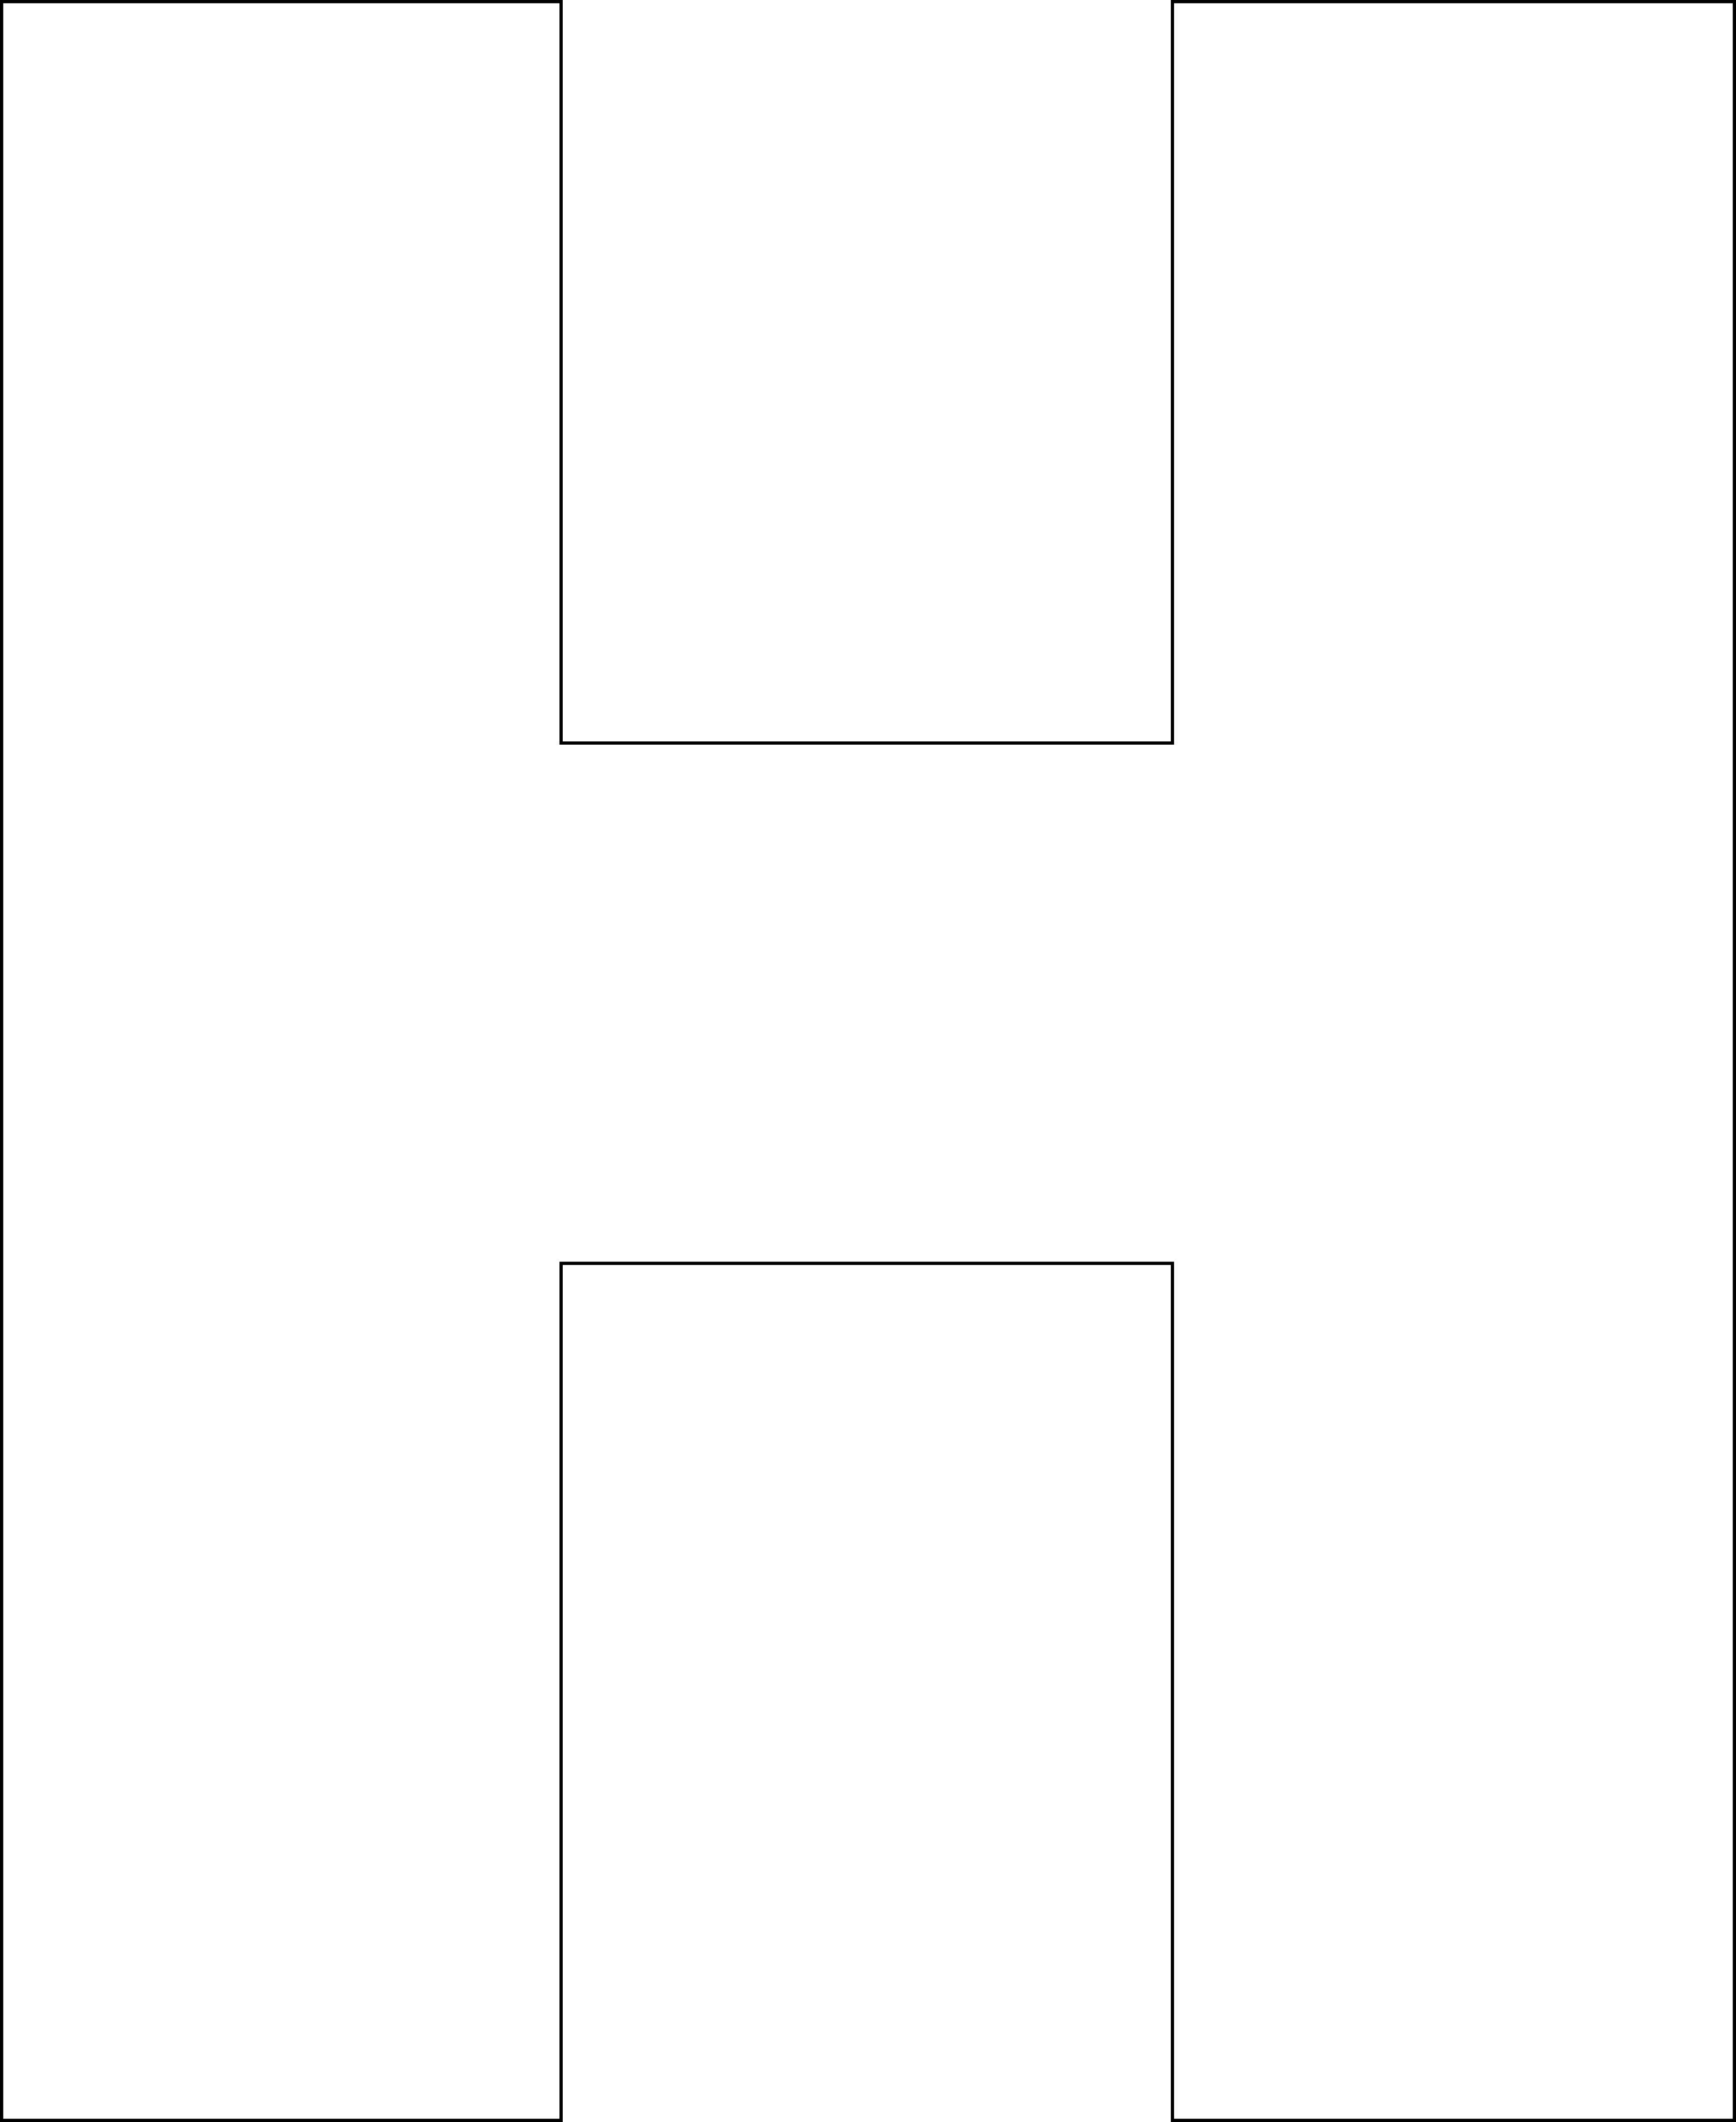 letter h template printable  Free Printable Alphabet Template Upper Case